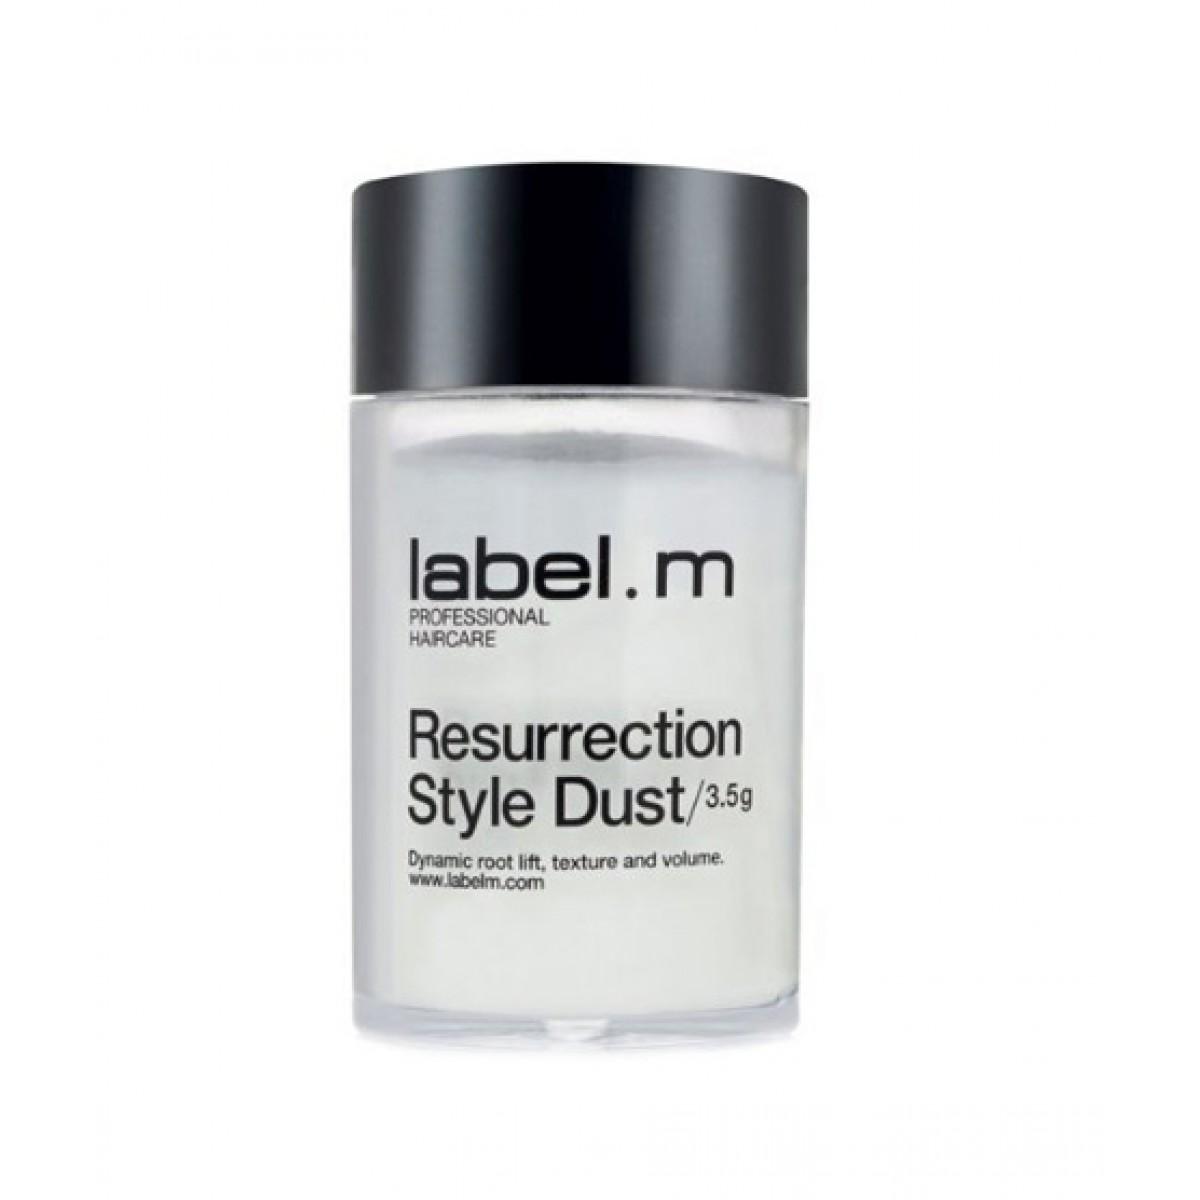 Label M Resurrection Style Dust 3.5g